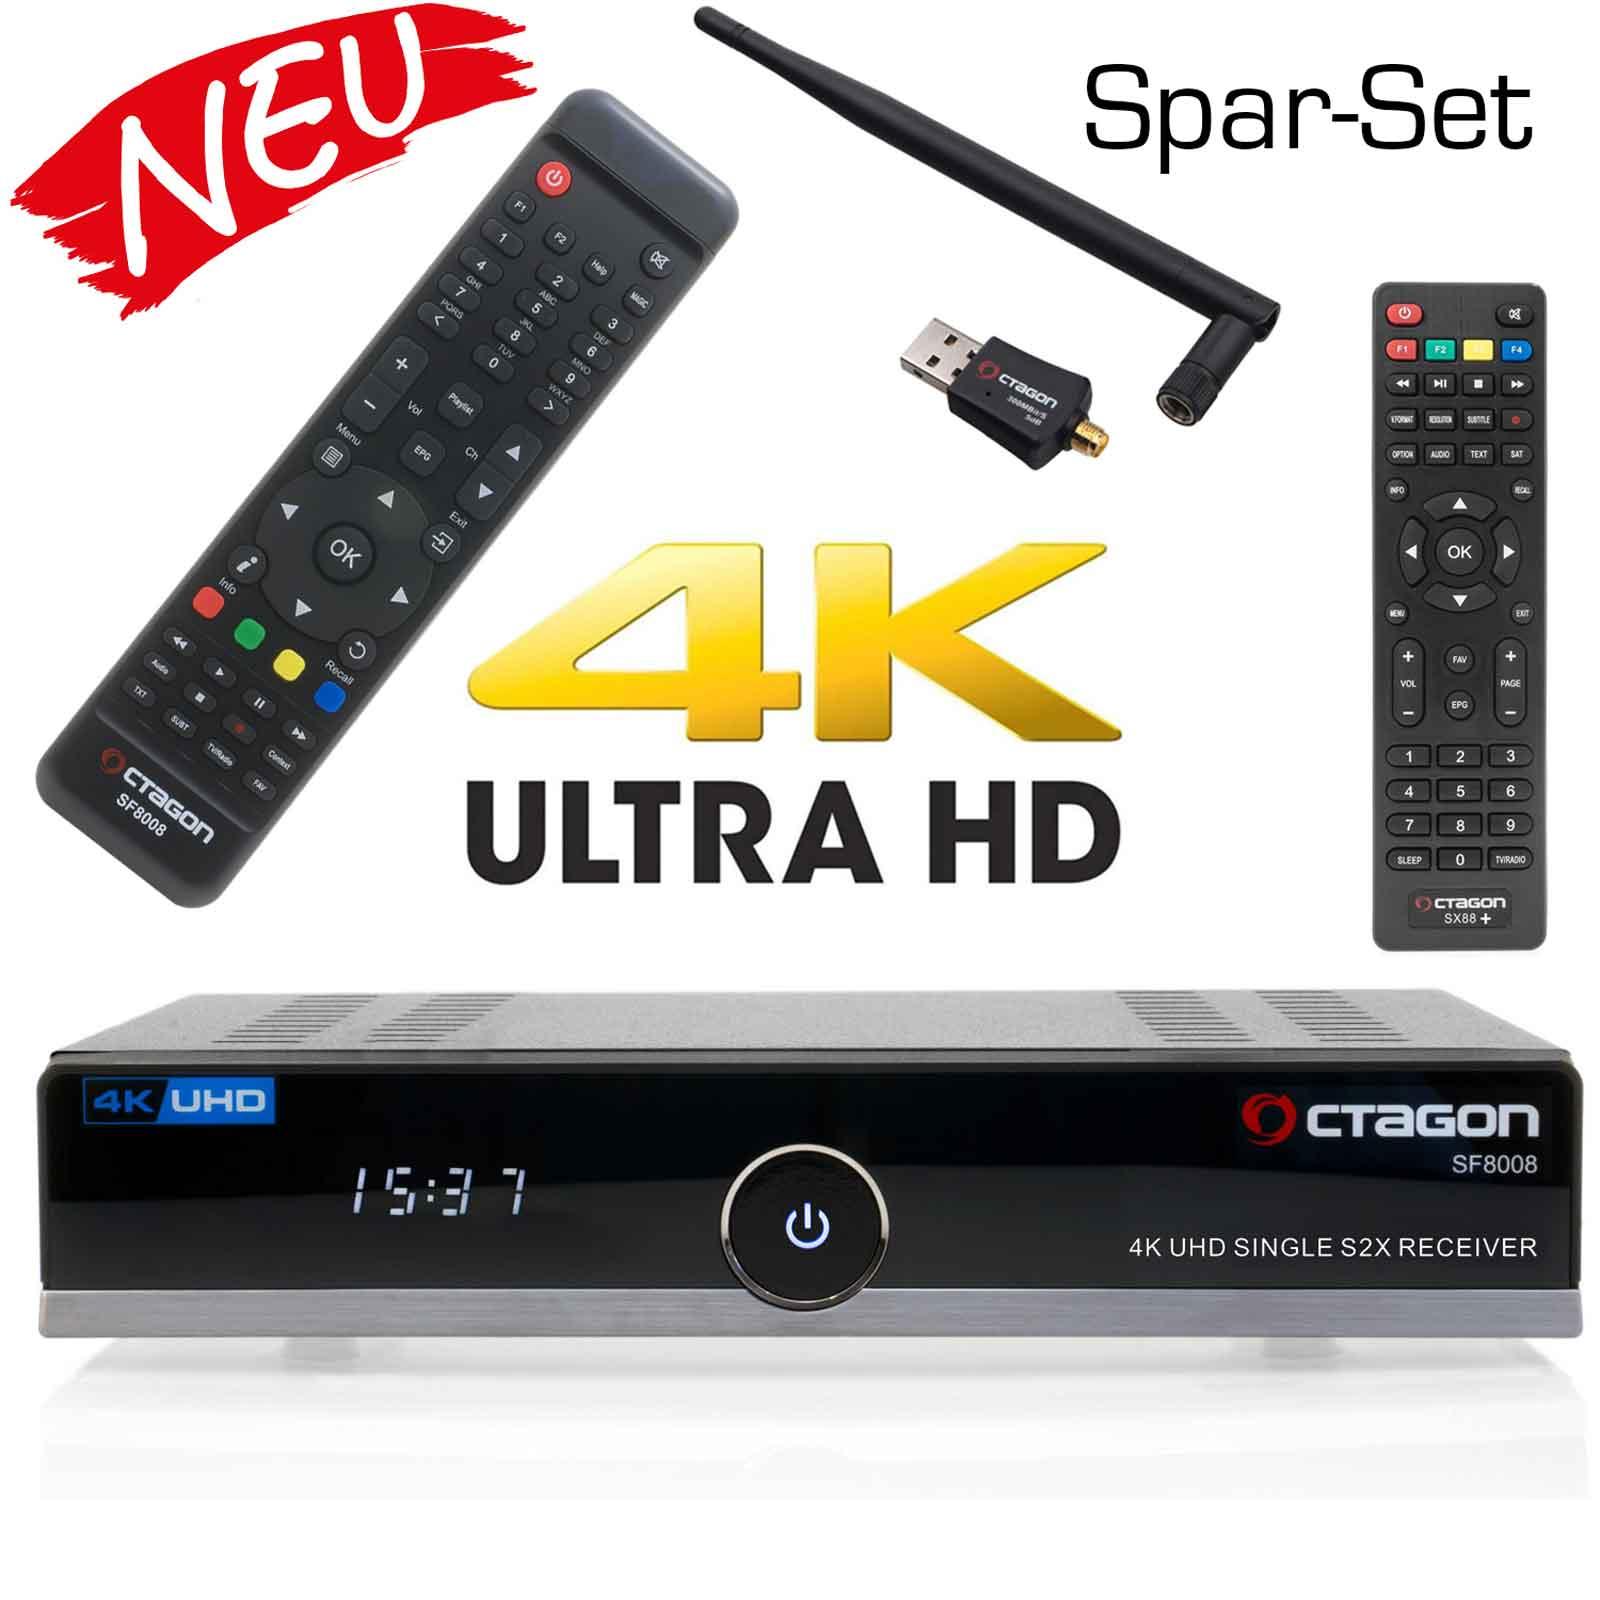 OCTAGON SF8008 4K UHD H.265 E2 Linux Dual Wifi DVB-S2x Single Receiver - Spar-Set